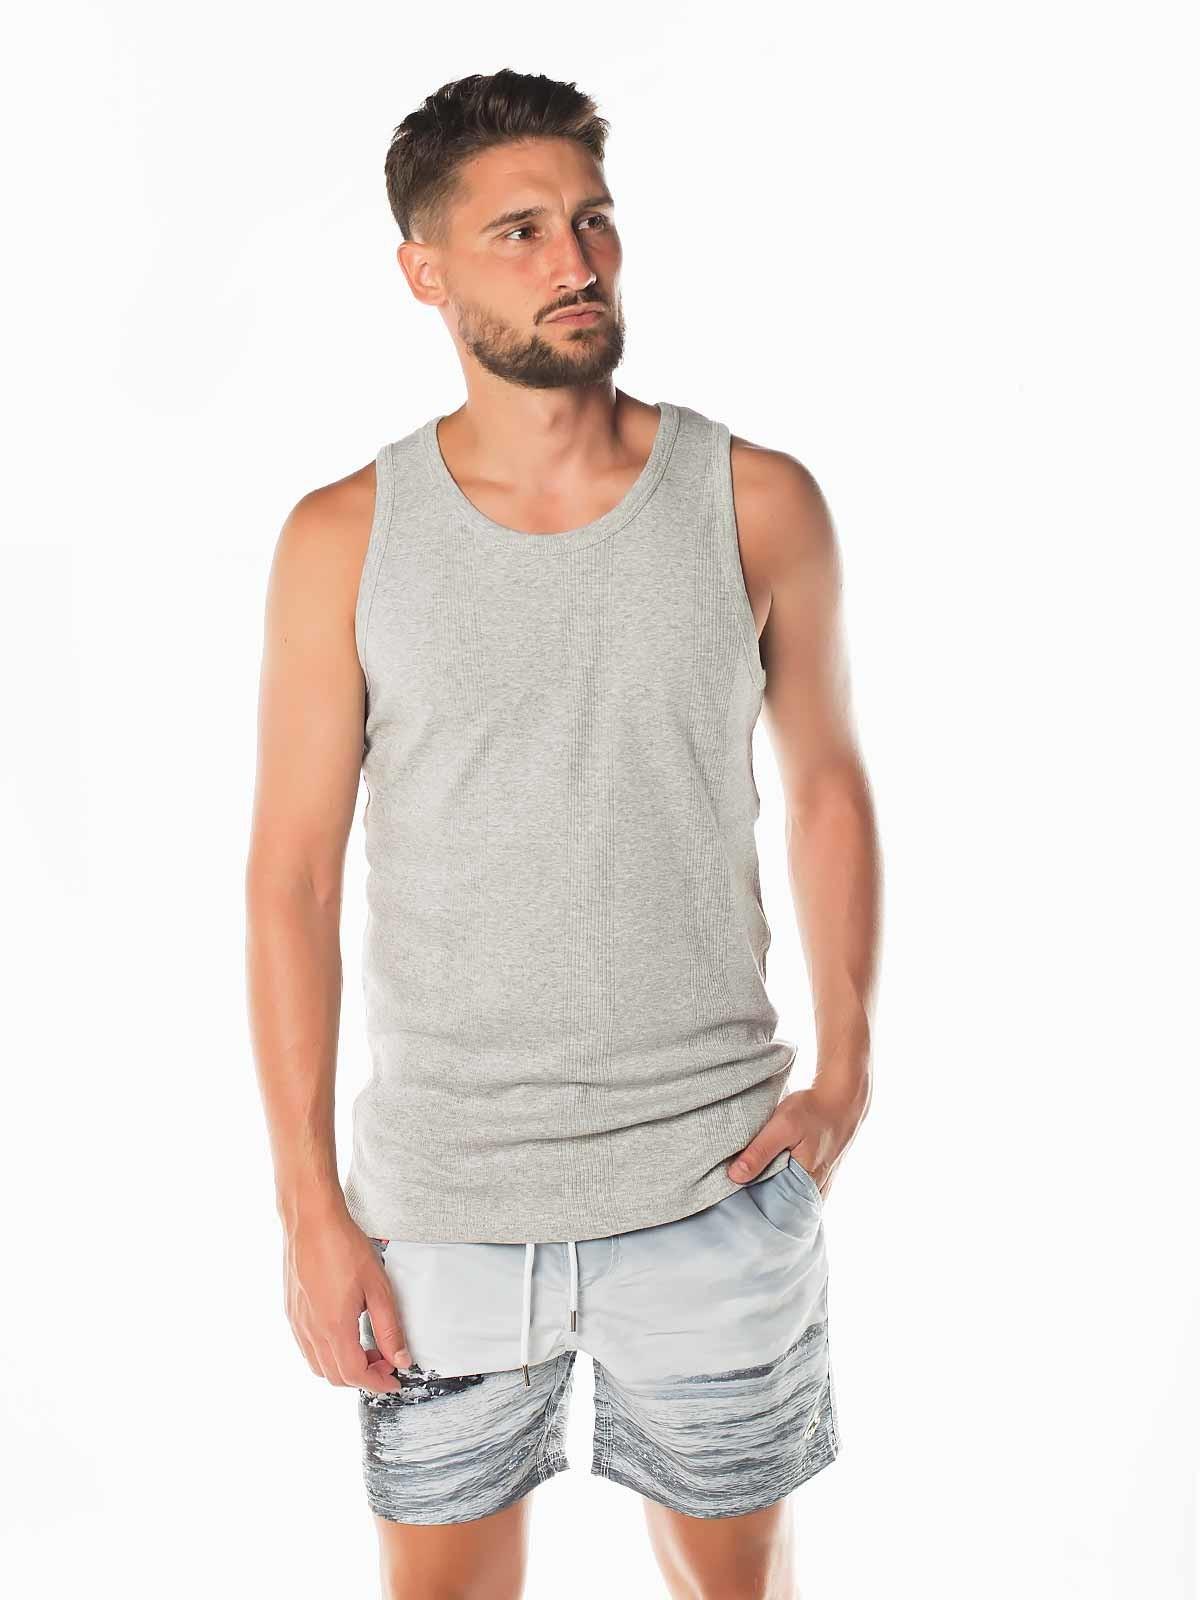 Camiseta sin mangas básica